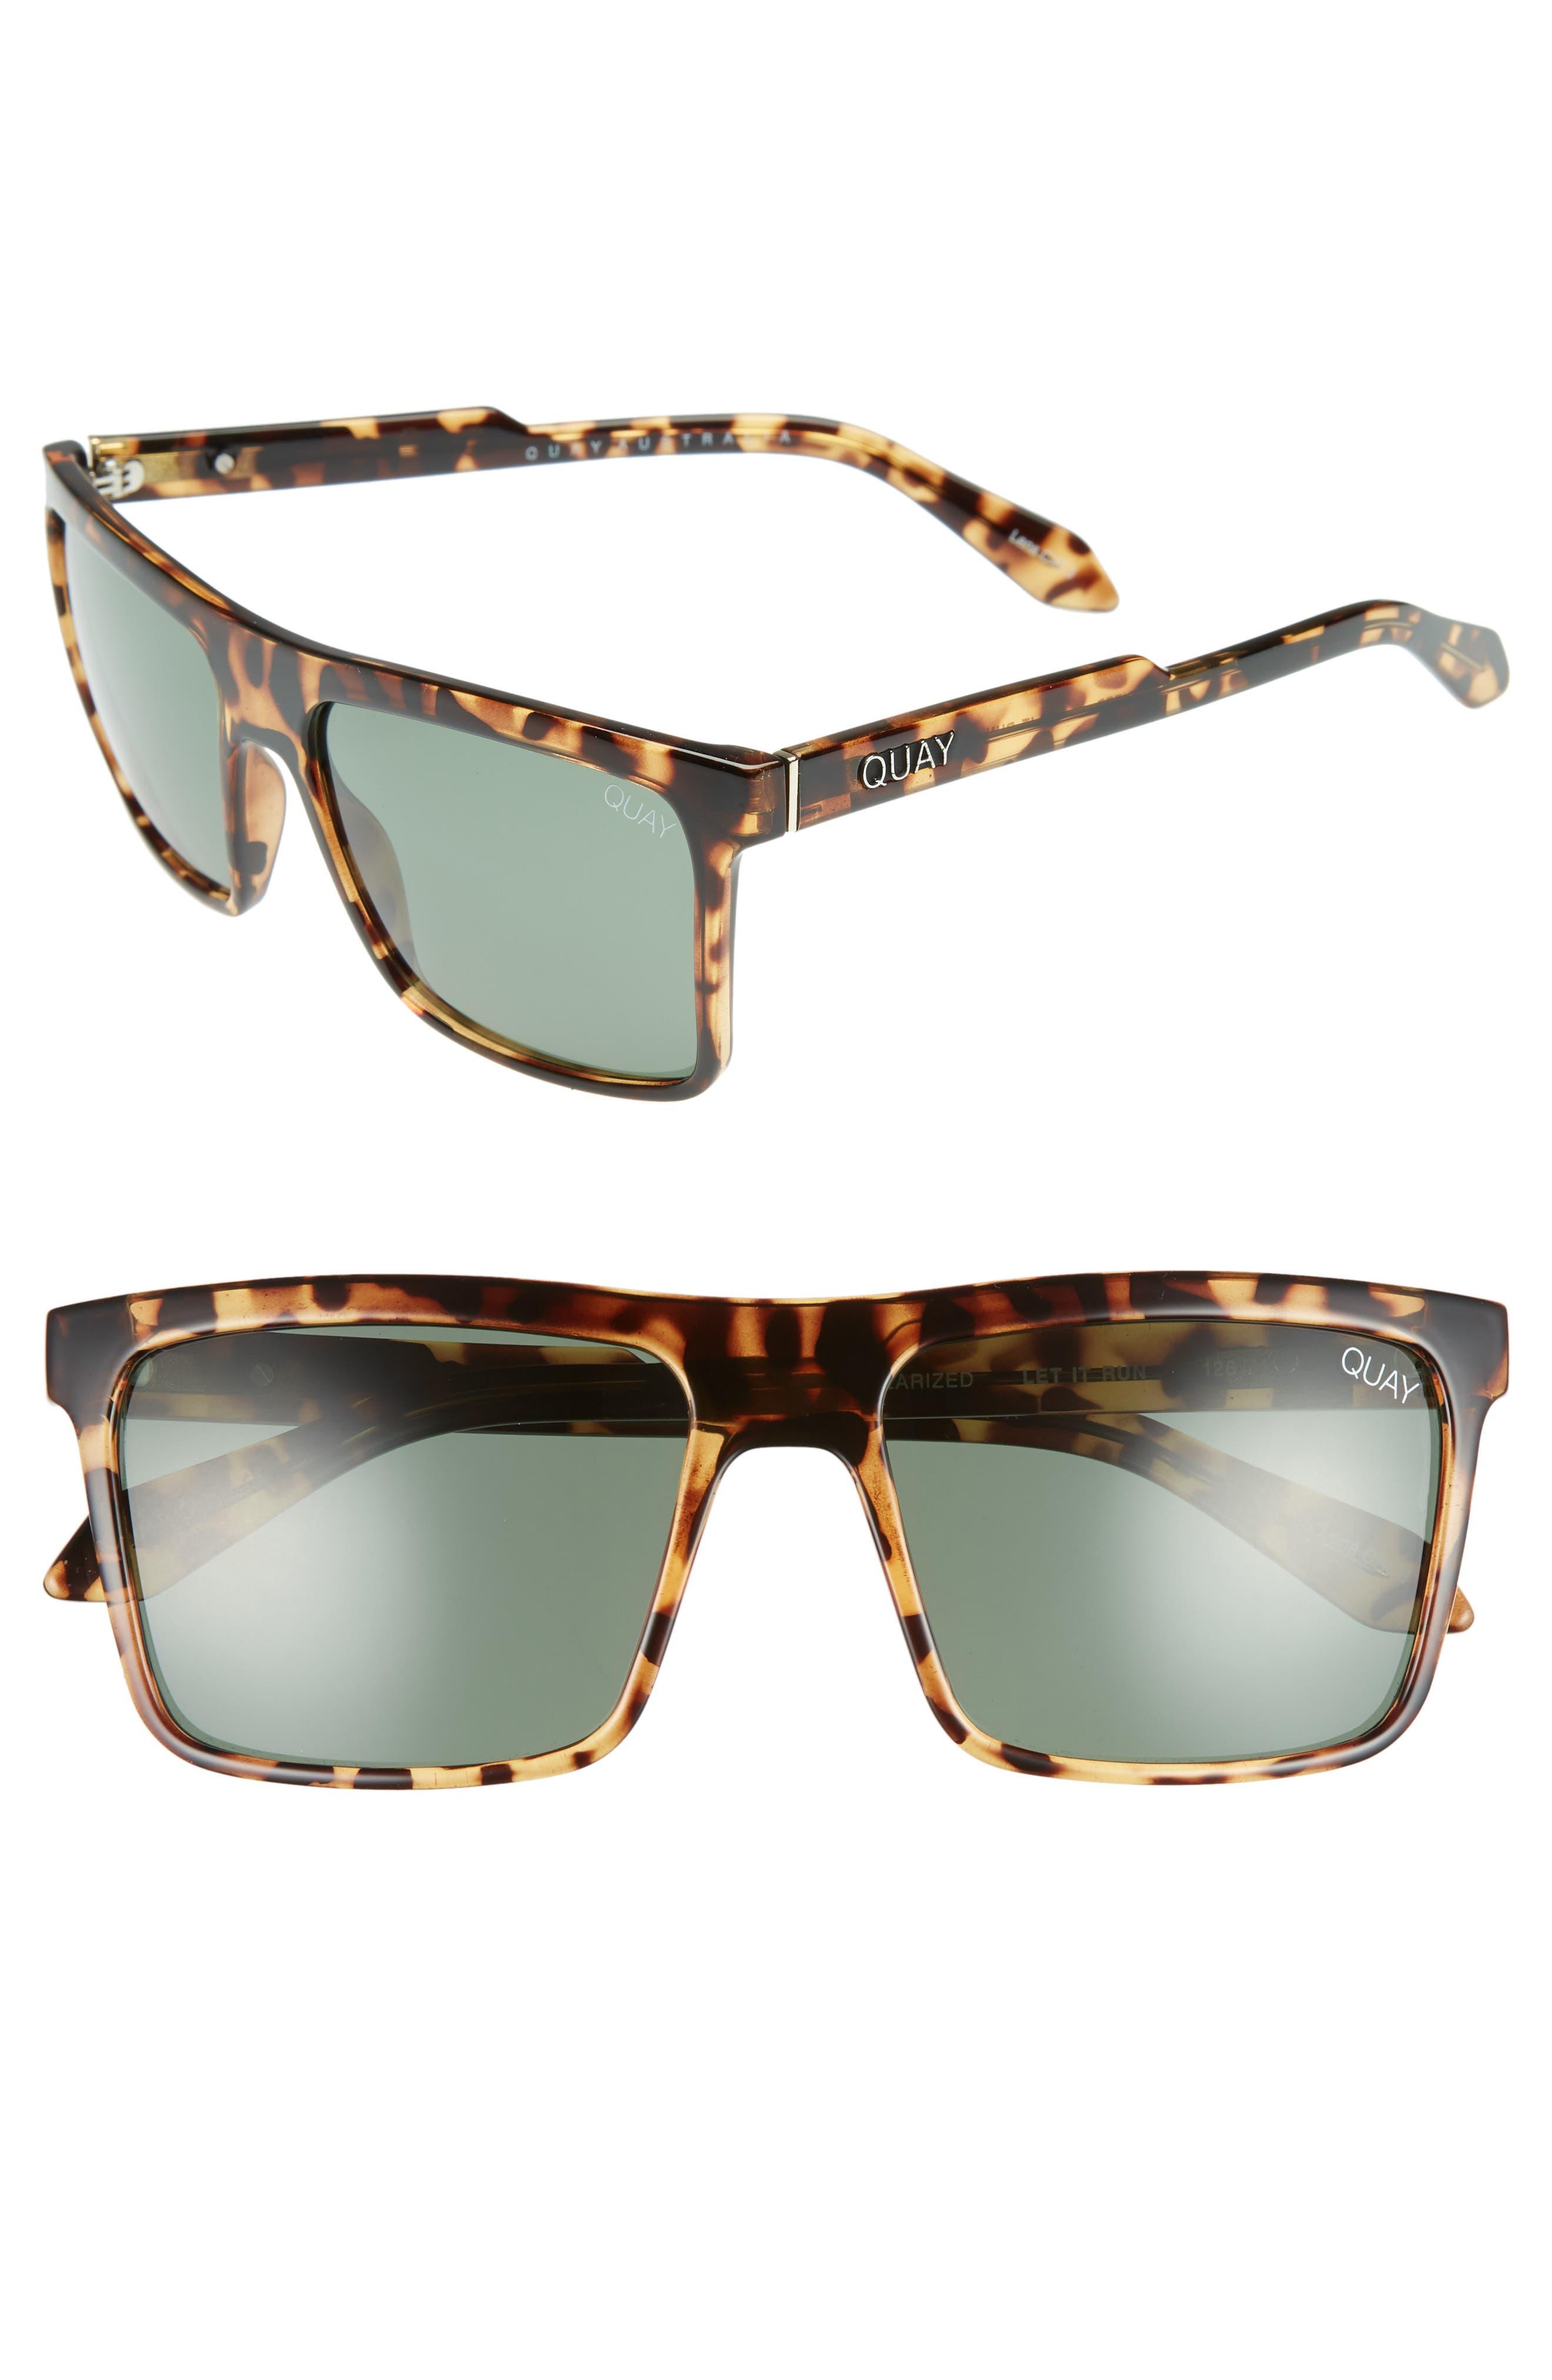 7d99efb8c661b9 Men s Quay Australia Sunglasses   Eyeglasses